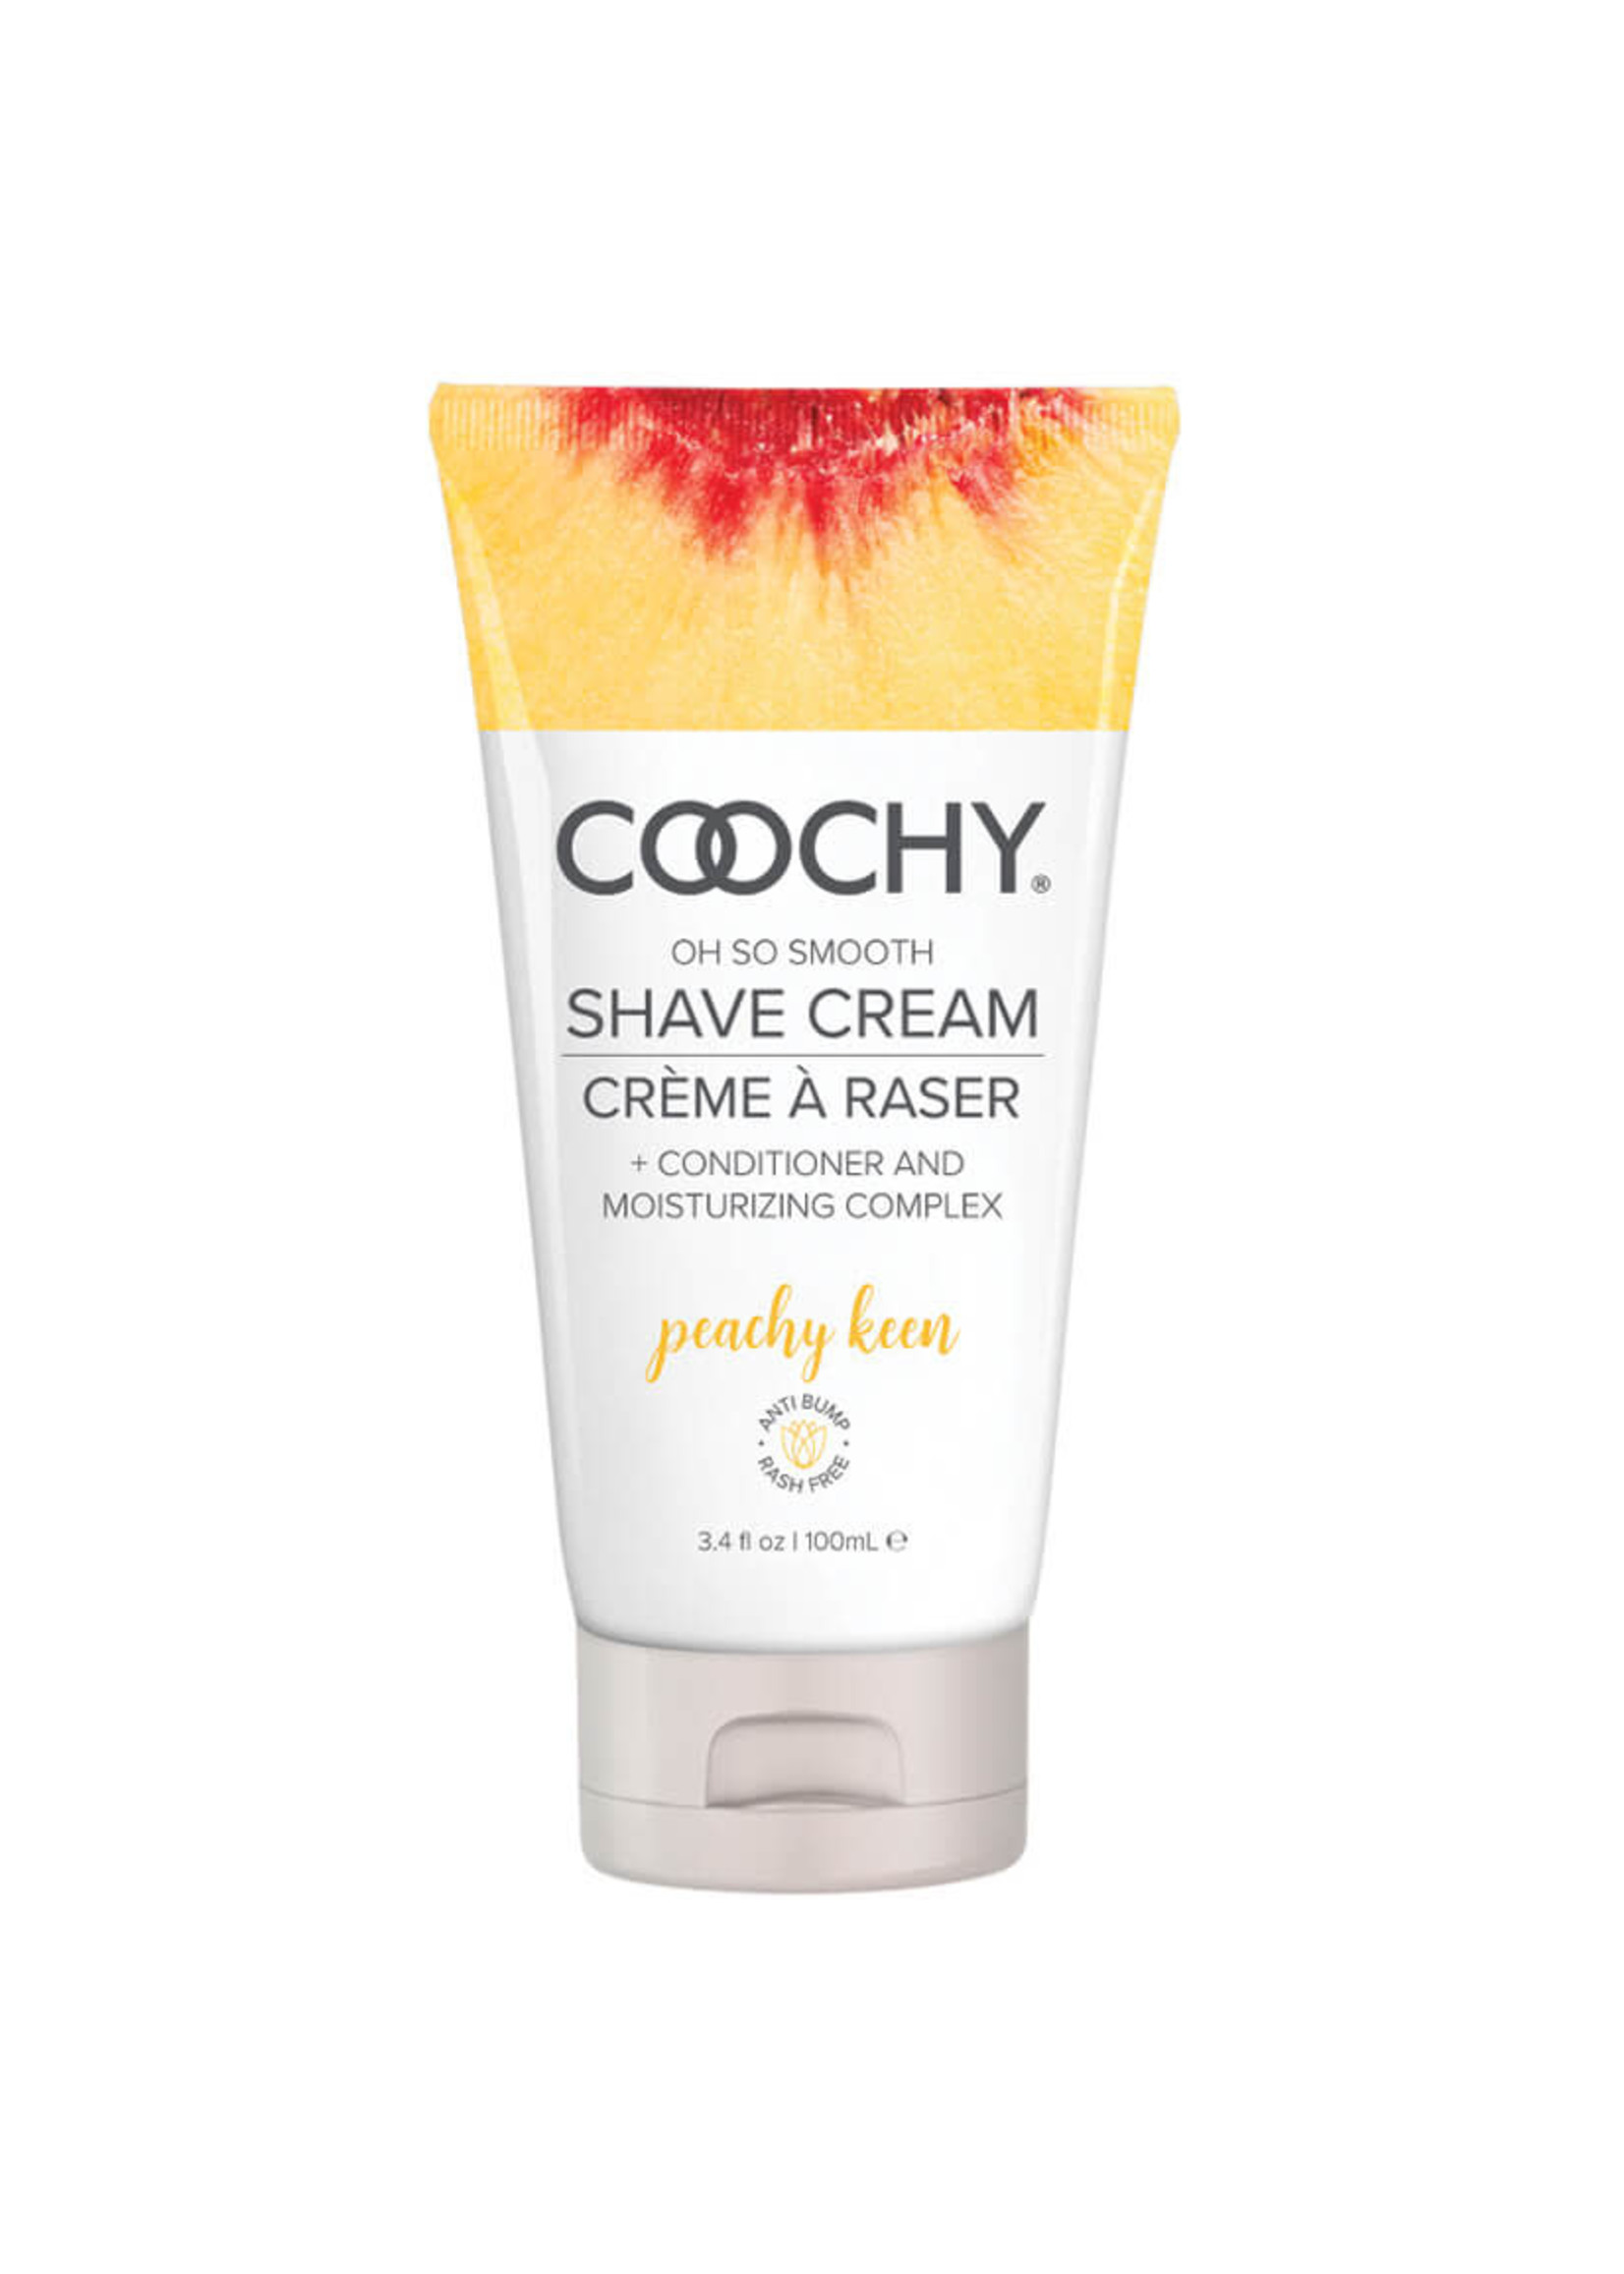 Coochy Peachy Keen 3.4oz